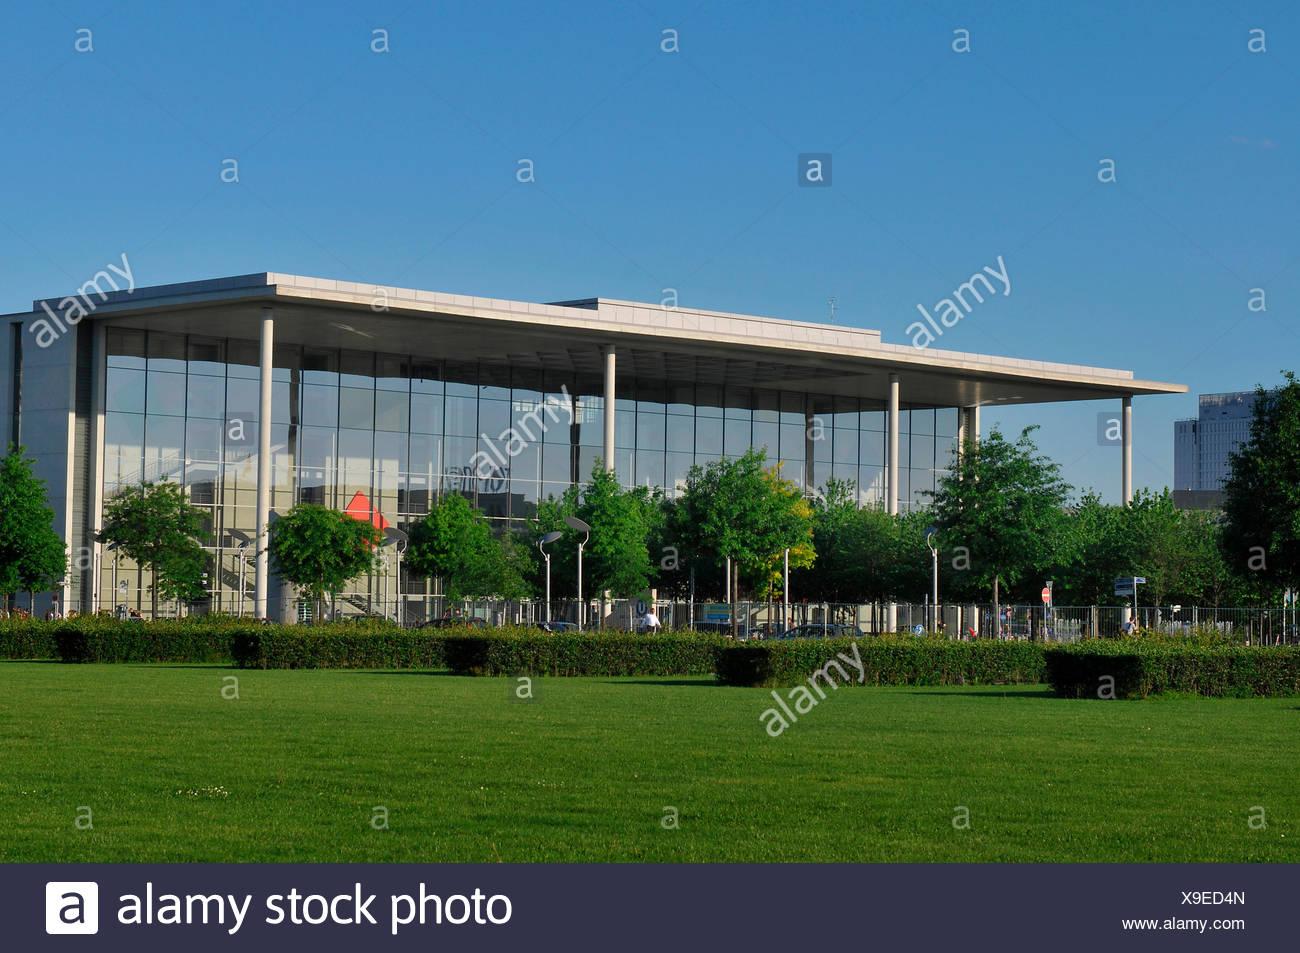 Paul-Loebe-Haus, Platz der Republik, Tiergarten, Mitte, Berlin, Deutschland Stockbild